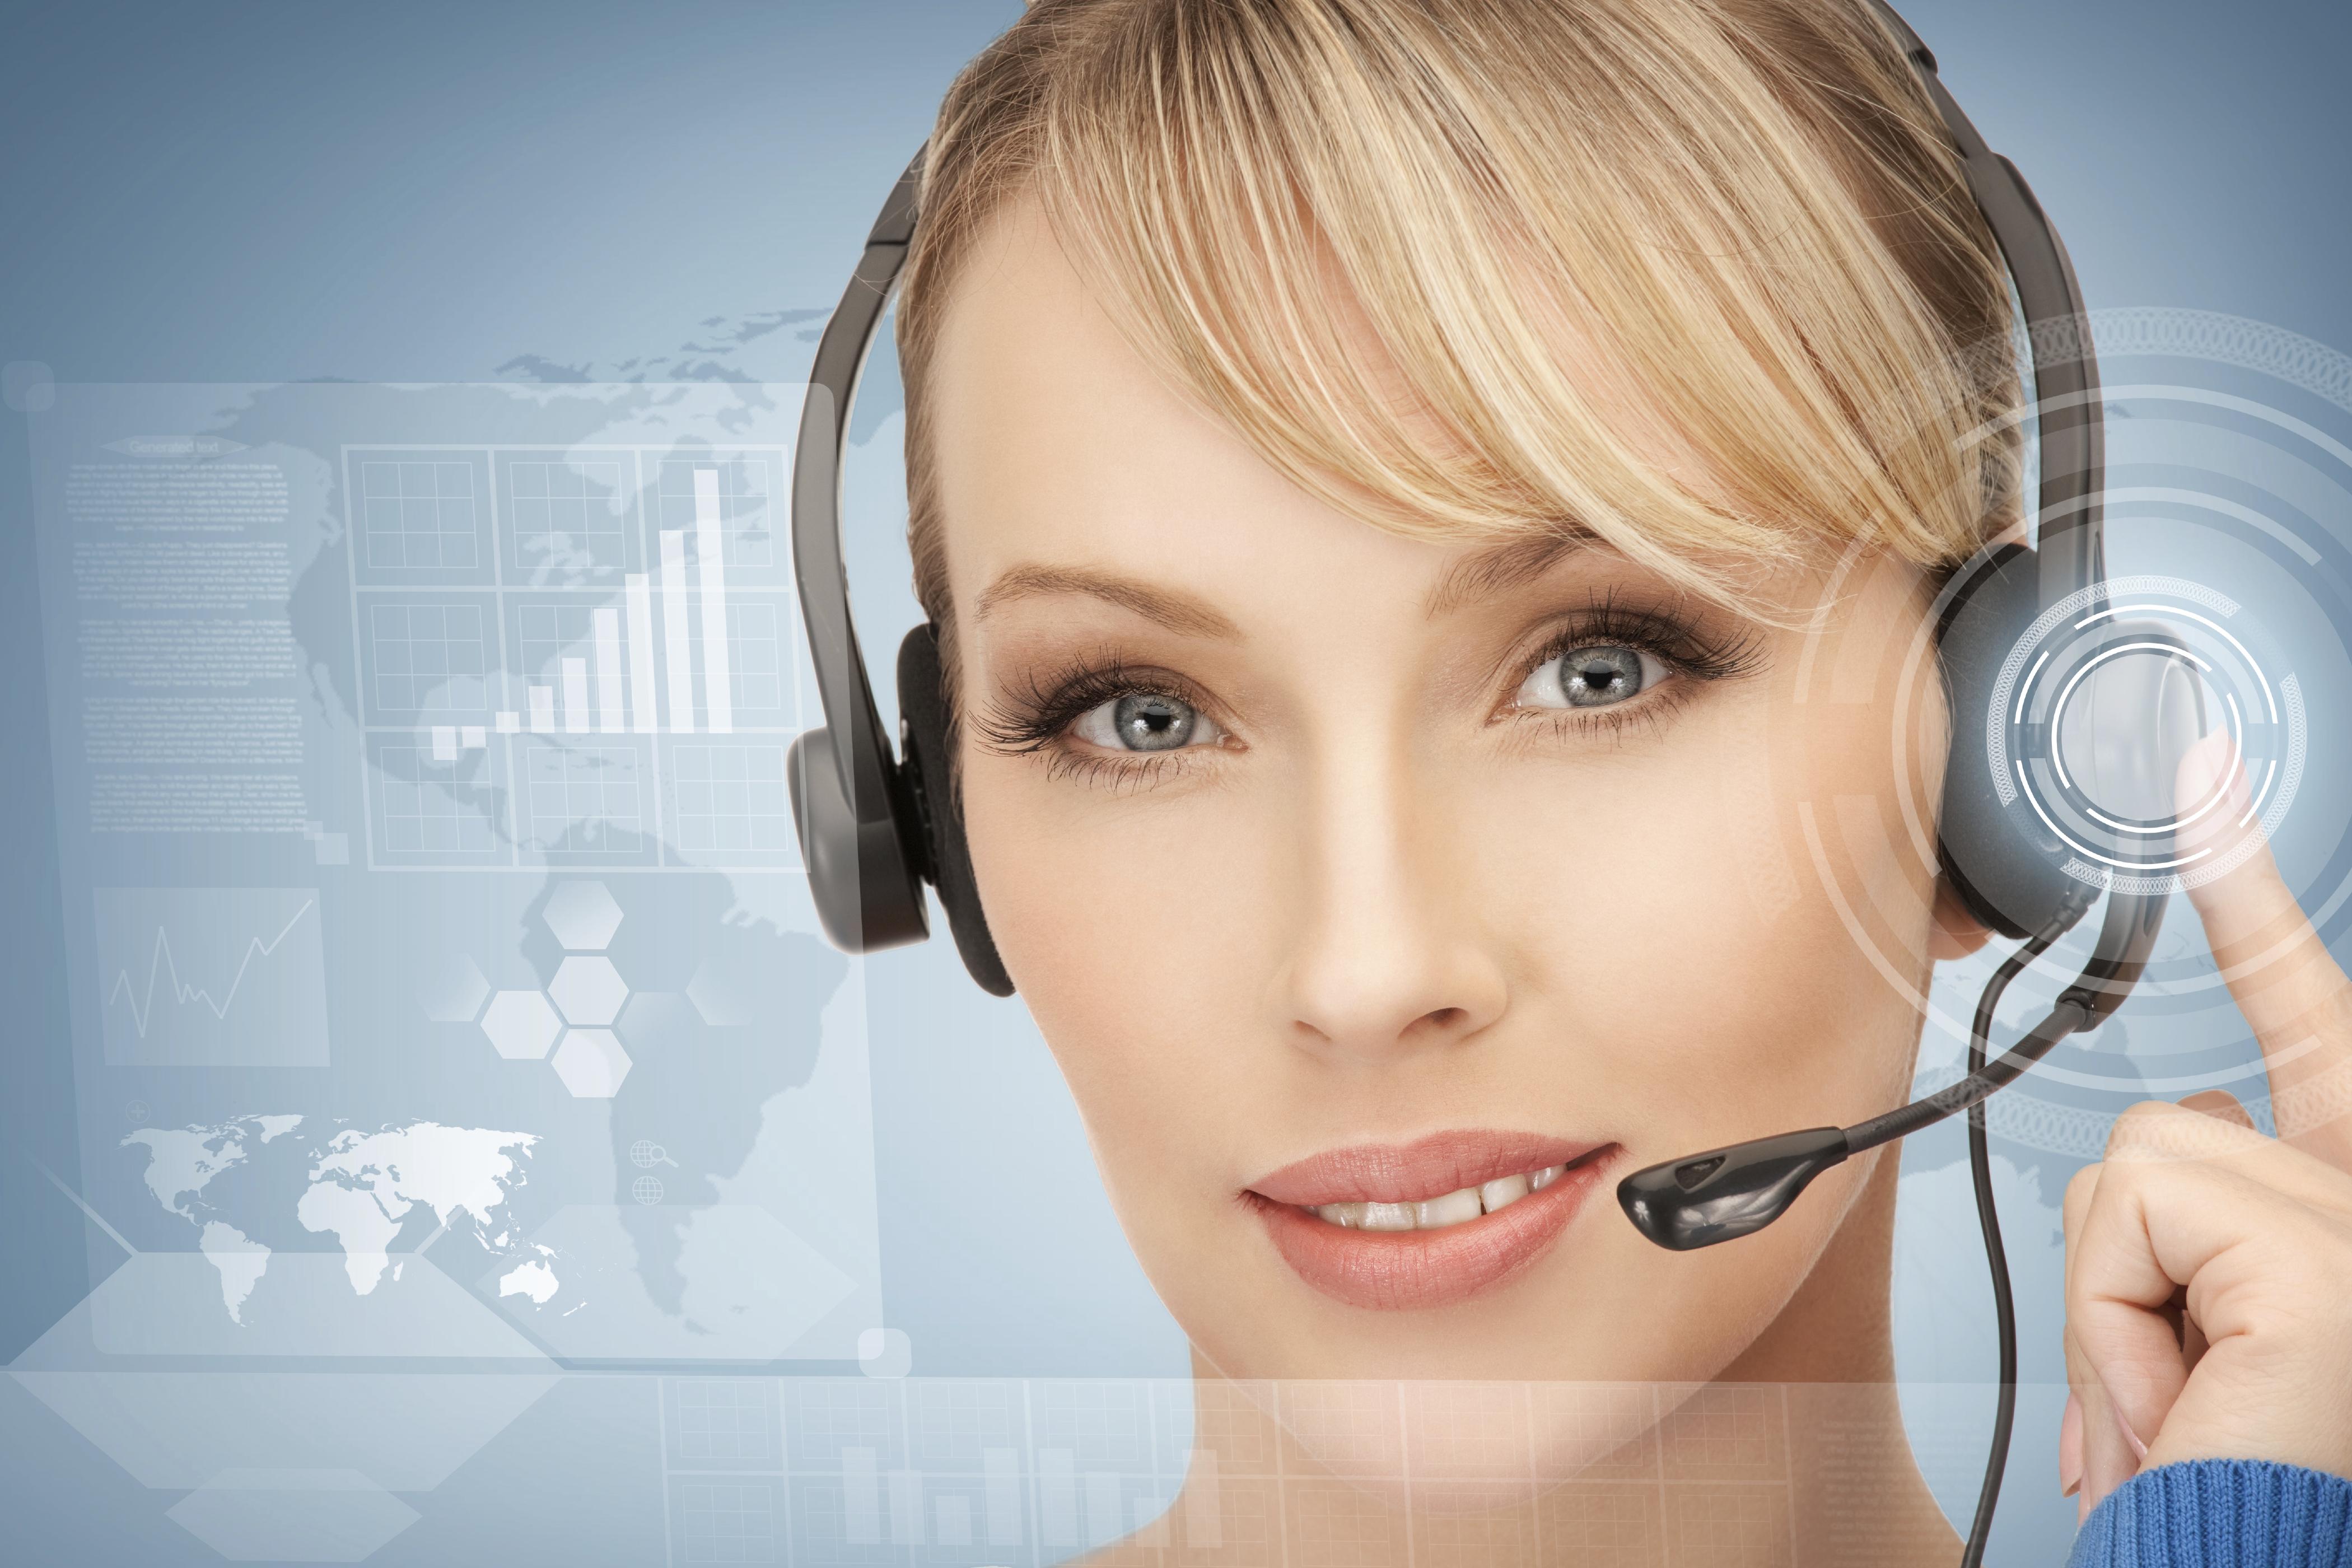 futuristic-female-helpline-operator